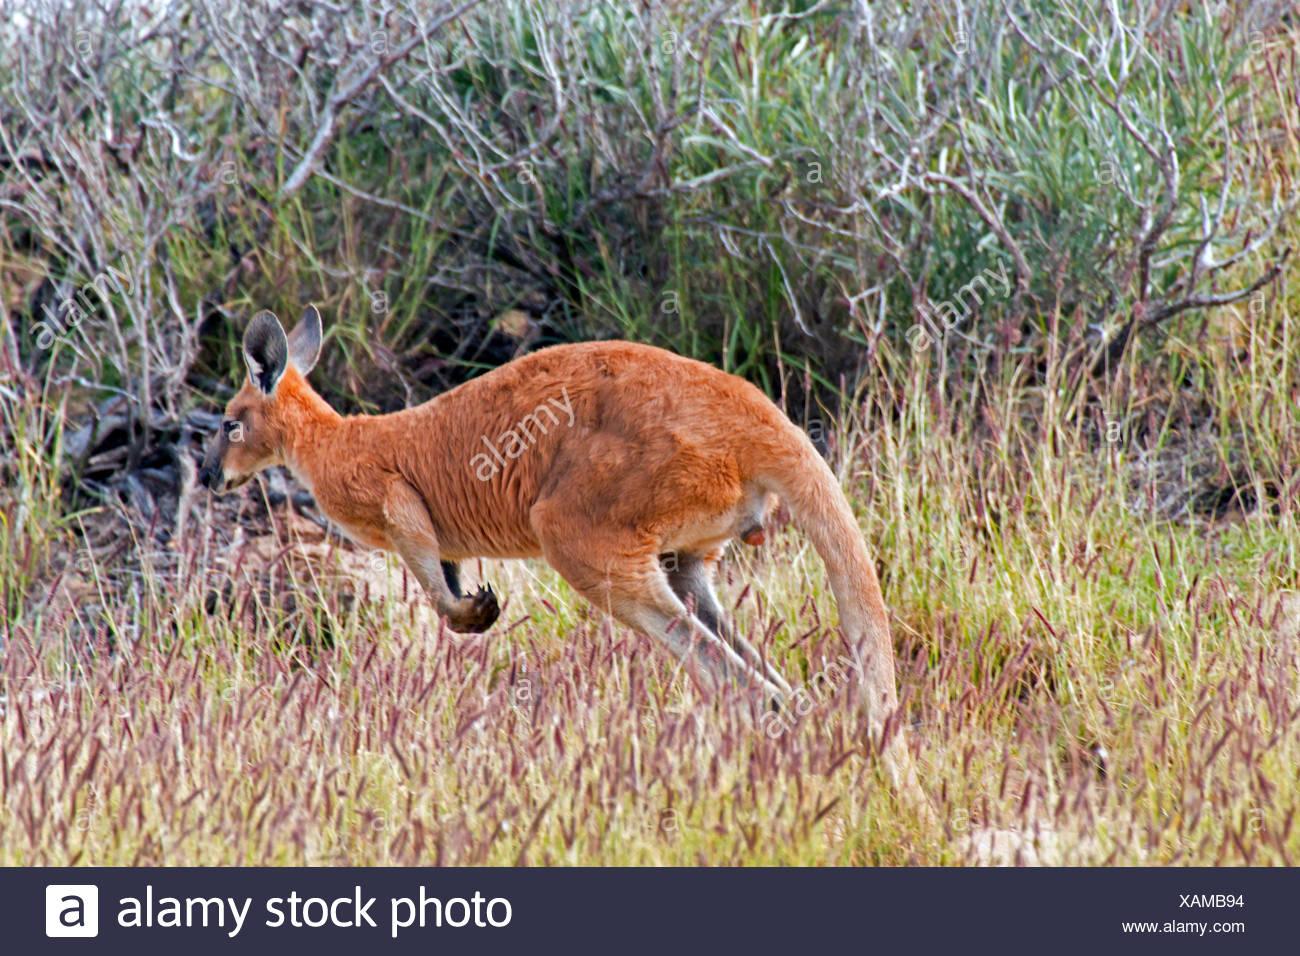 red kangaroo, plains Kangaroo, blue flier (Macropus rufus, Megaleia rufa), jumping in the shrubbery, Australia, Western Australia - Stock Image